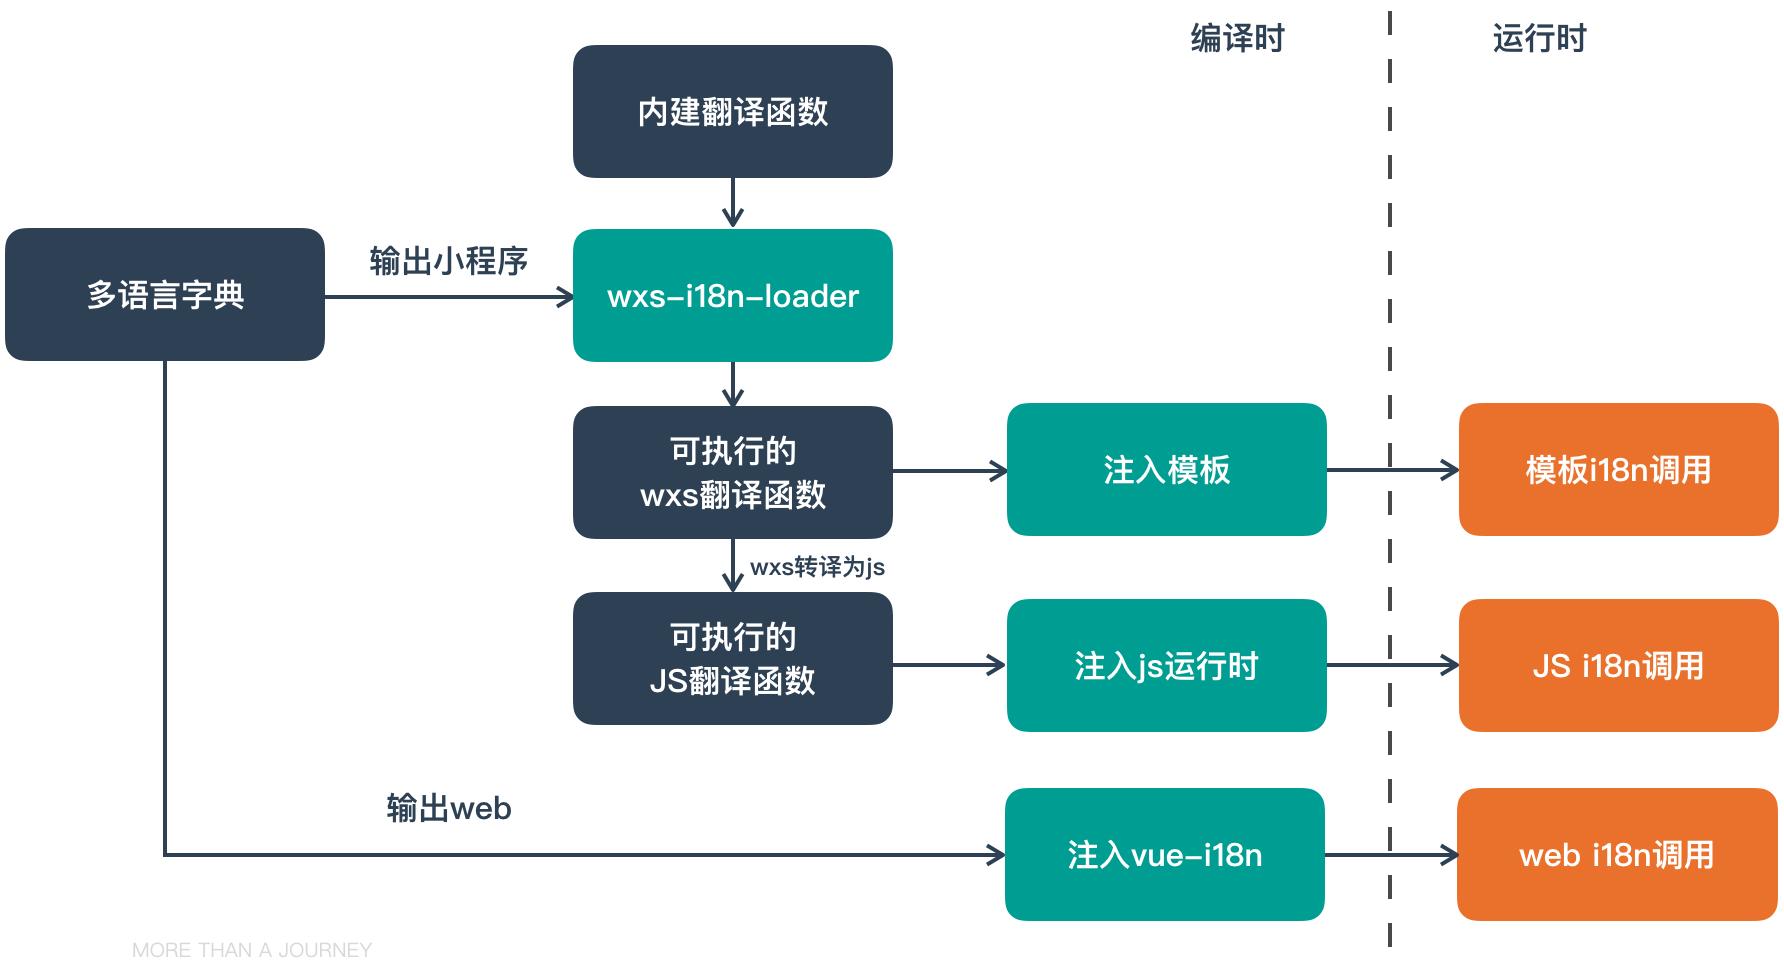 mpx-i18n内部流程示意图